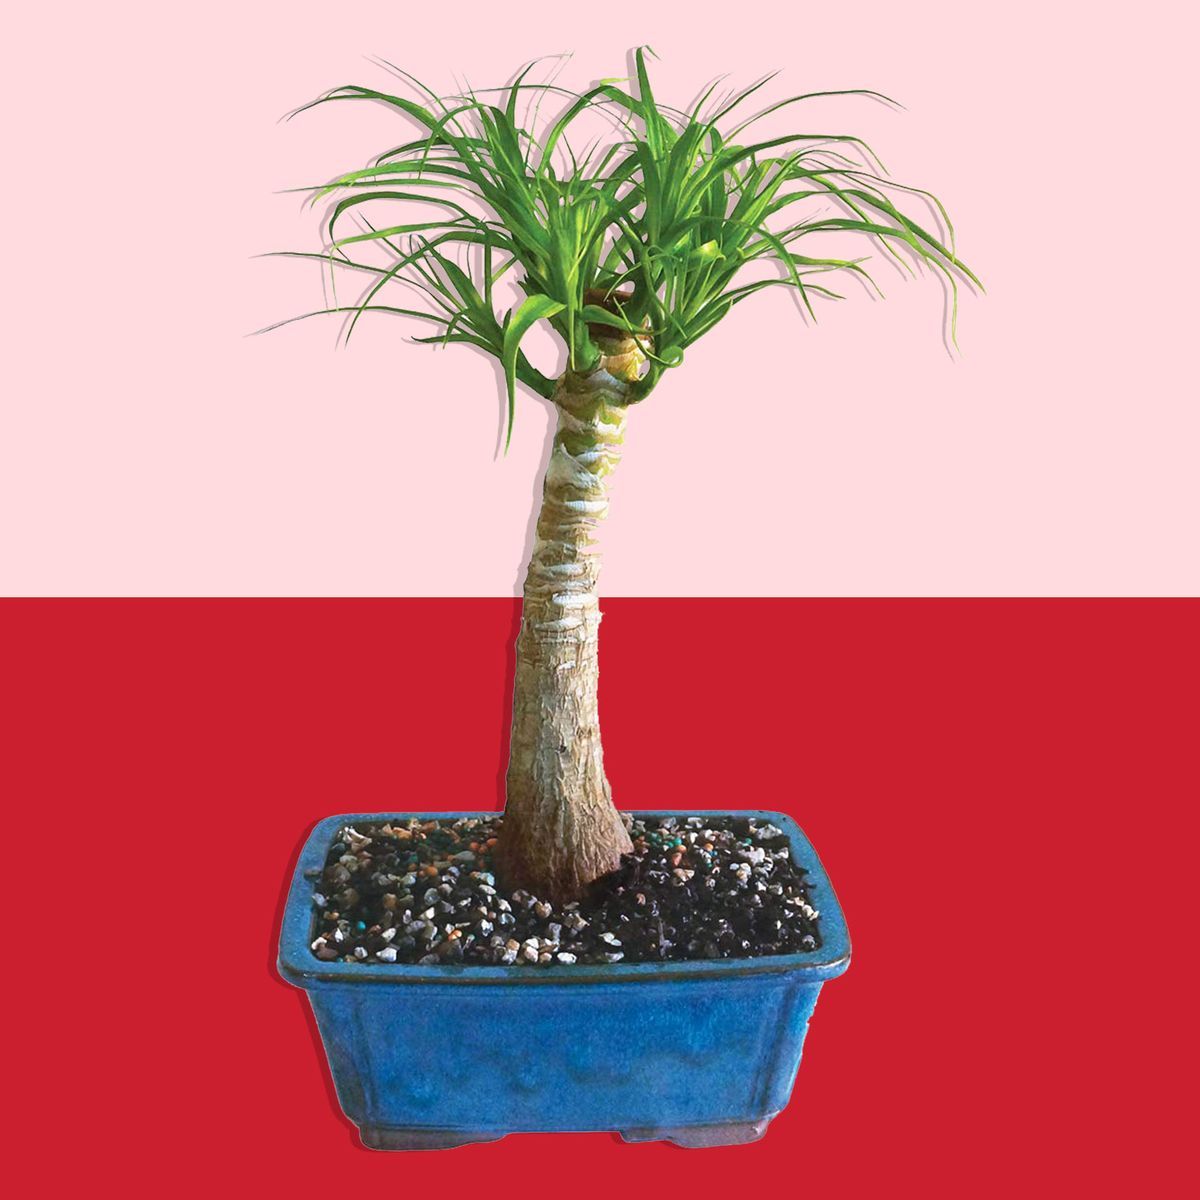 Brussel S Live Pony Tail Palm Indoor Bonsai Tree Sale Amazon The Strategist New York Magazine